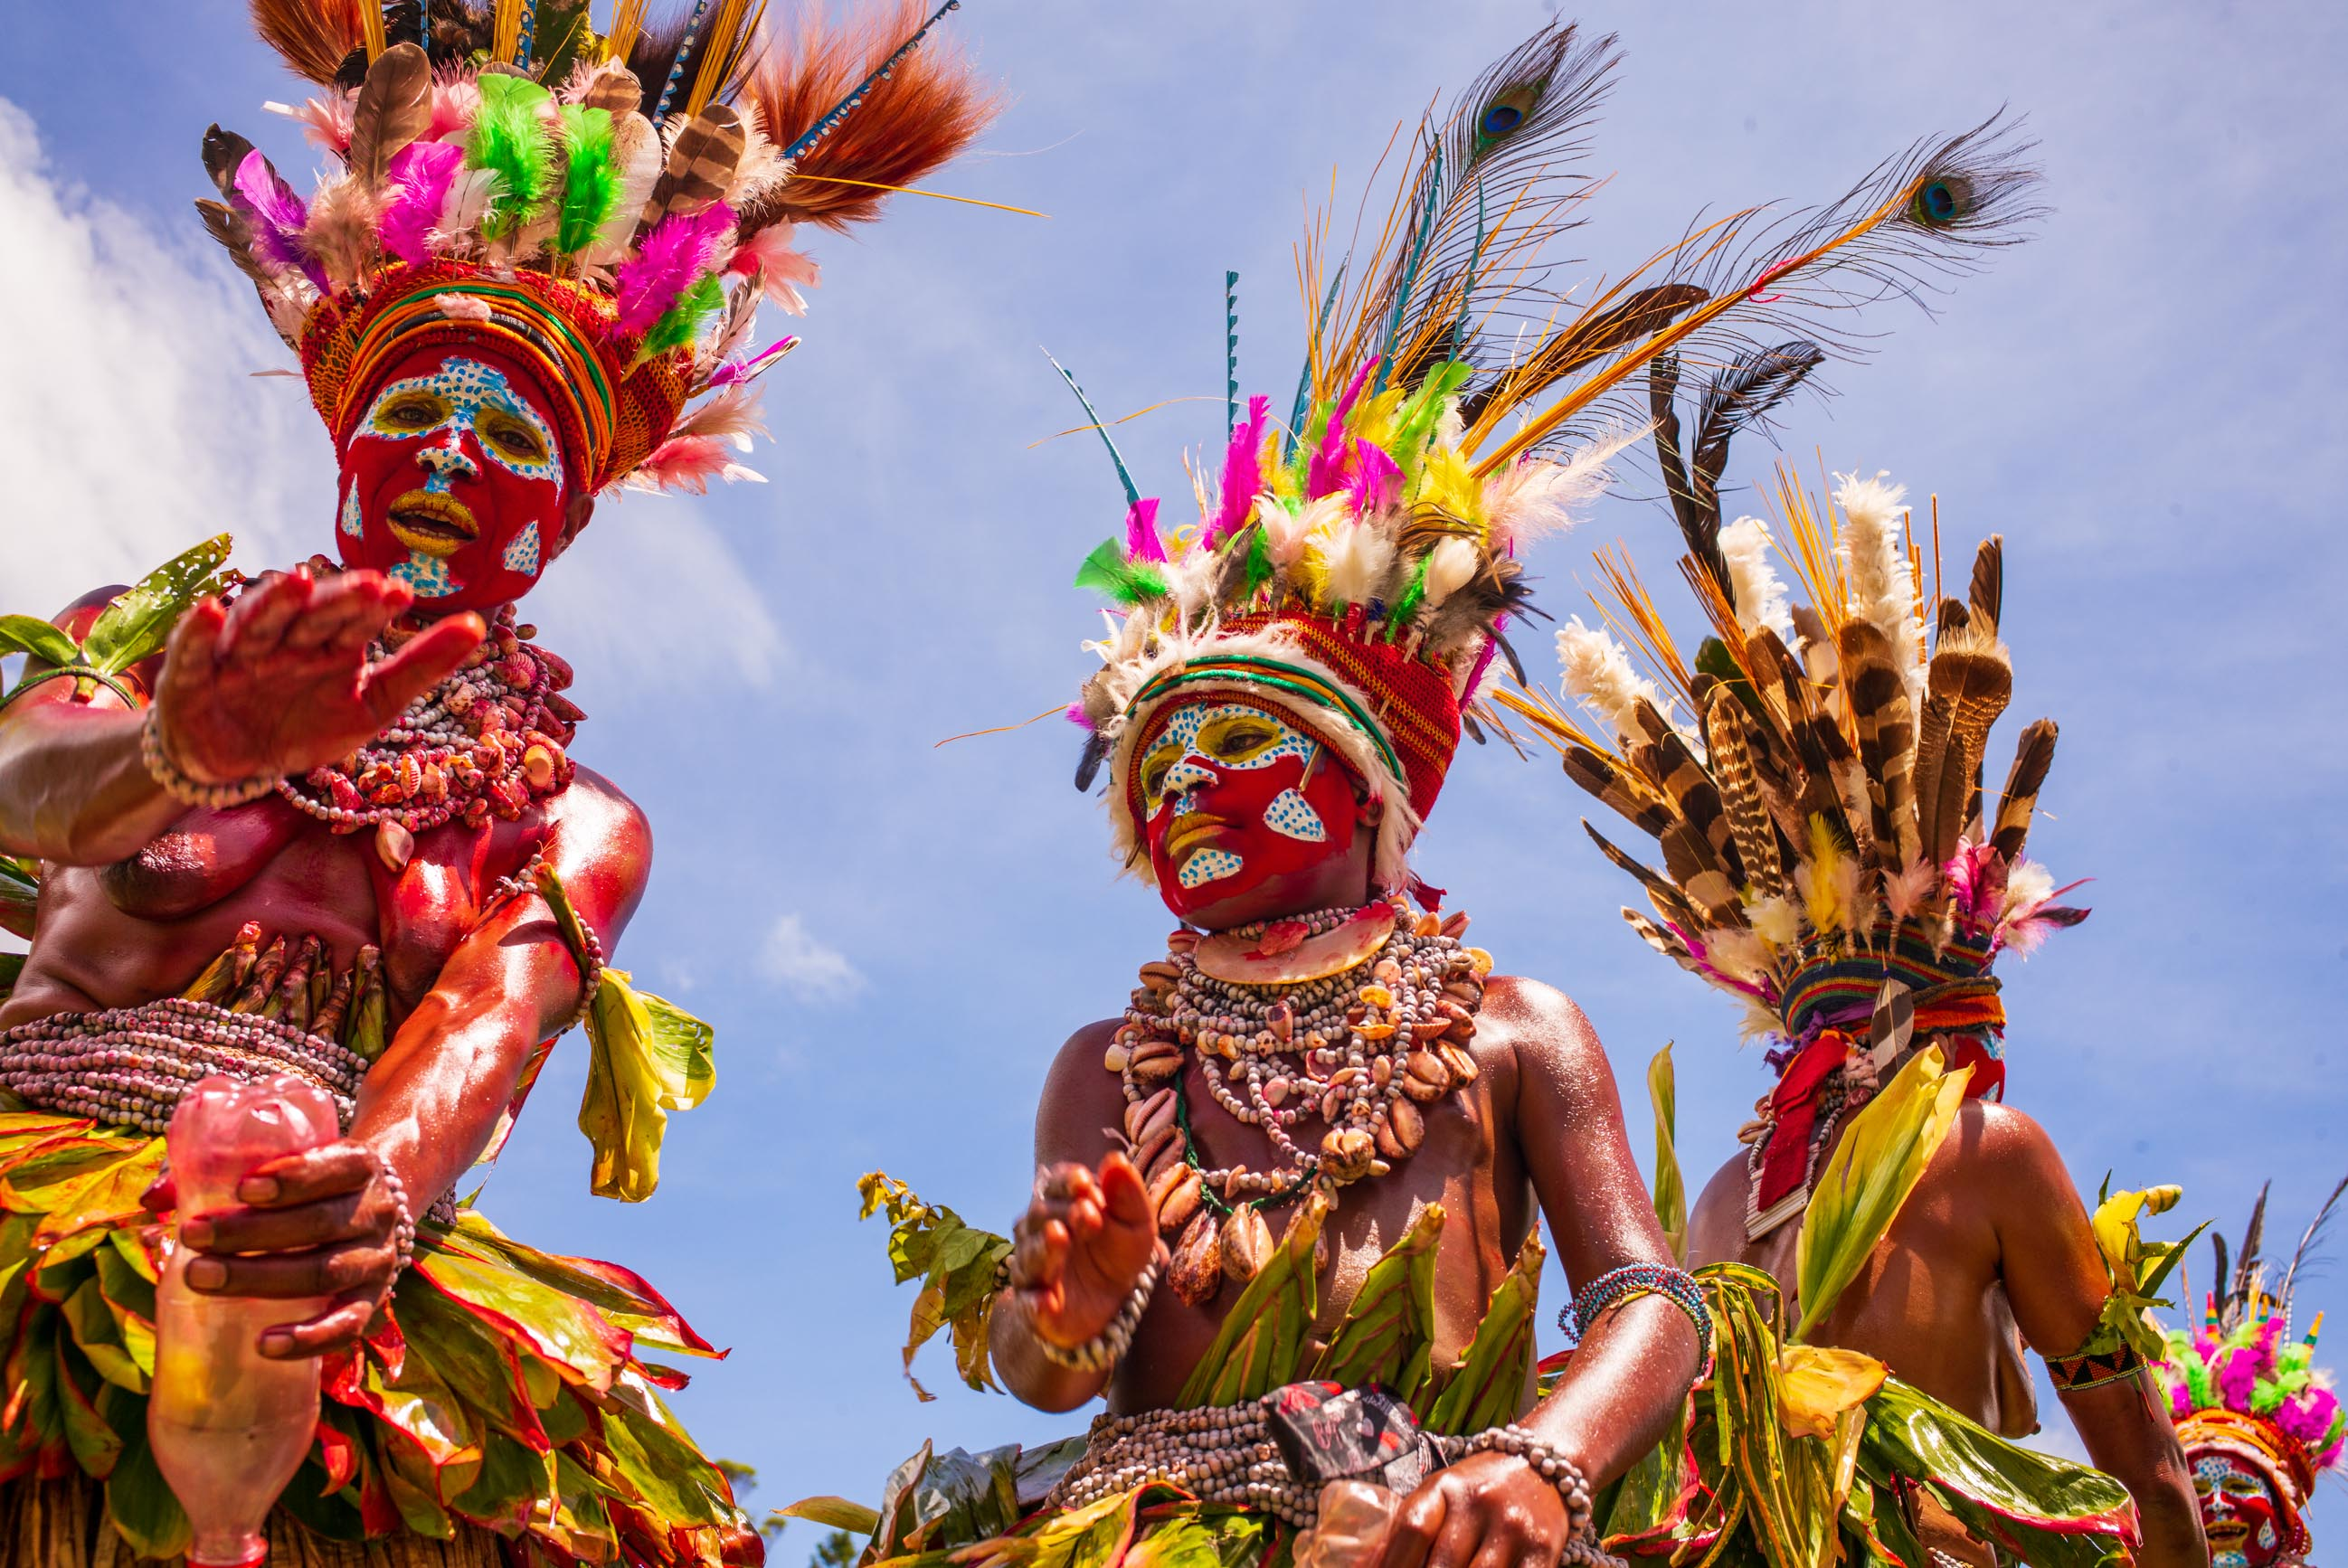 https://bubo.sk/uploads/galleries/7442/lubosfellner_papuanovaguinea_l1008984.jpg